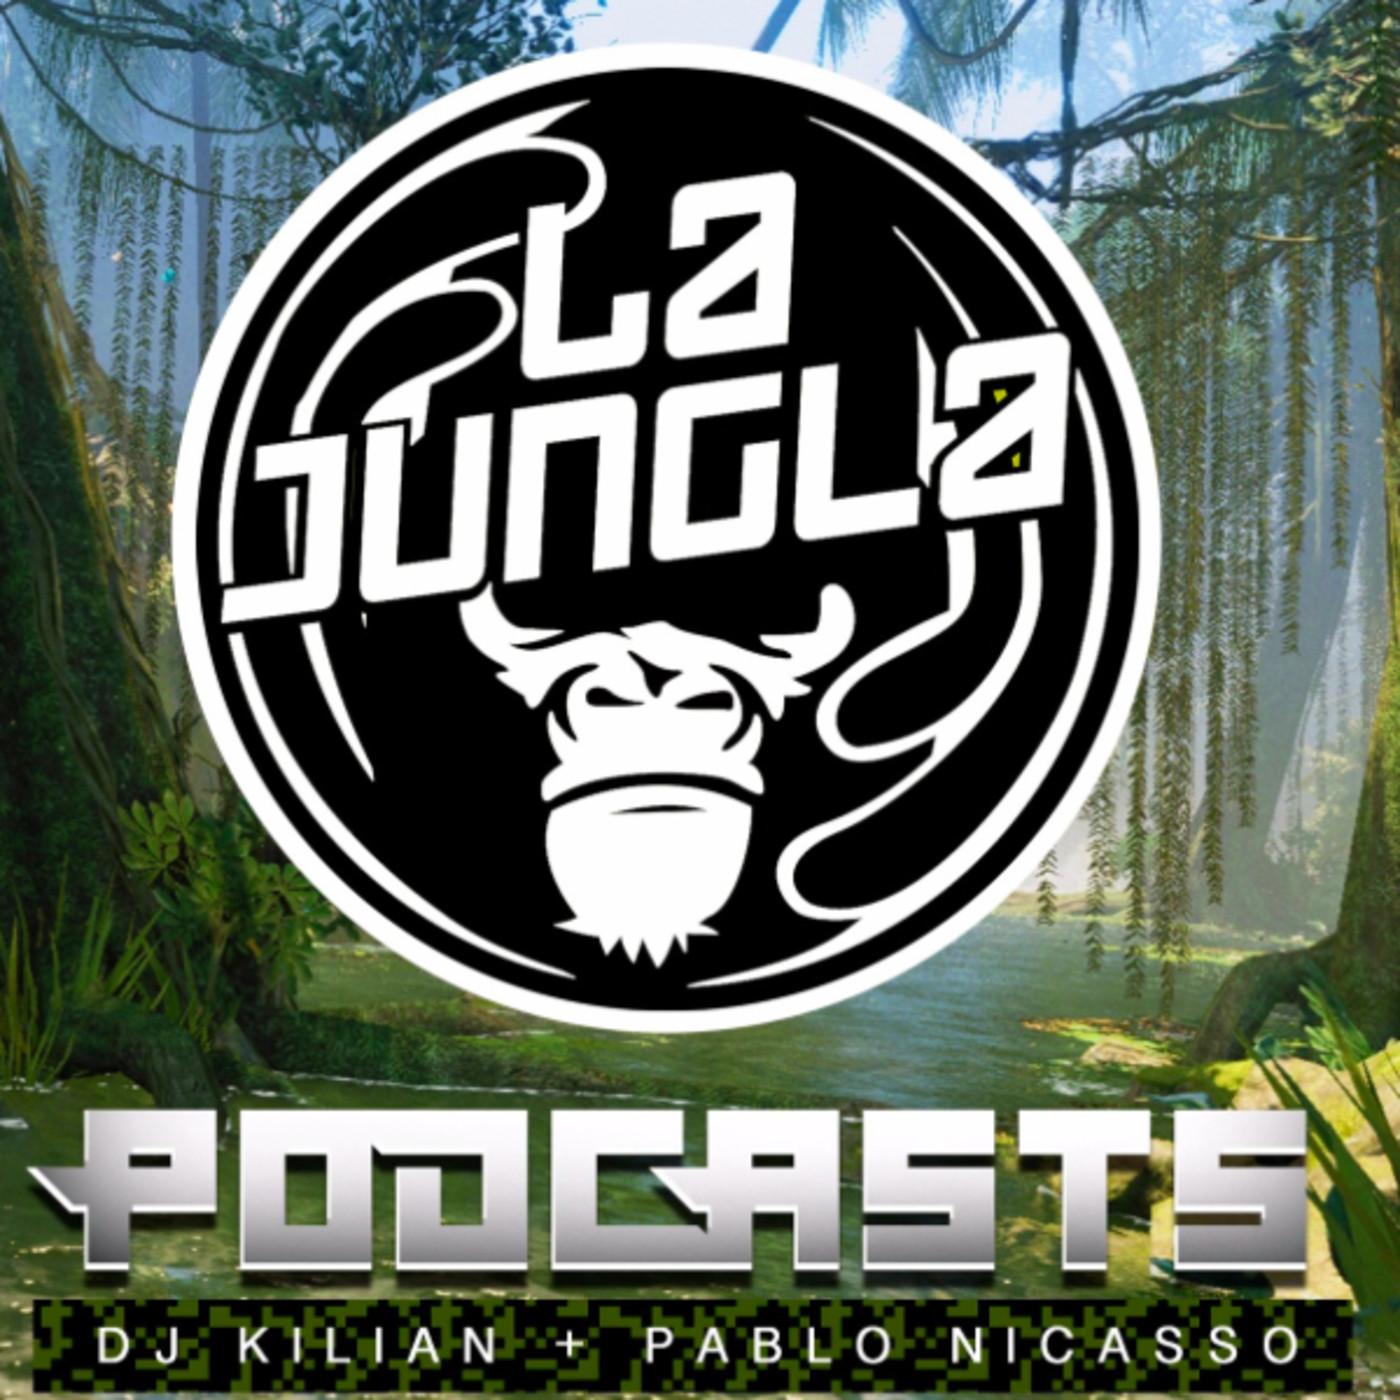 LA JUNGLA BAND - 1x02 - Pablo Nicasso y Dj Kilian